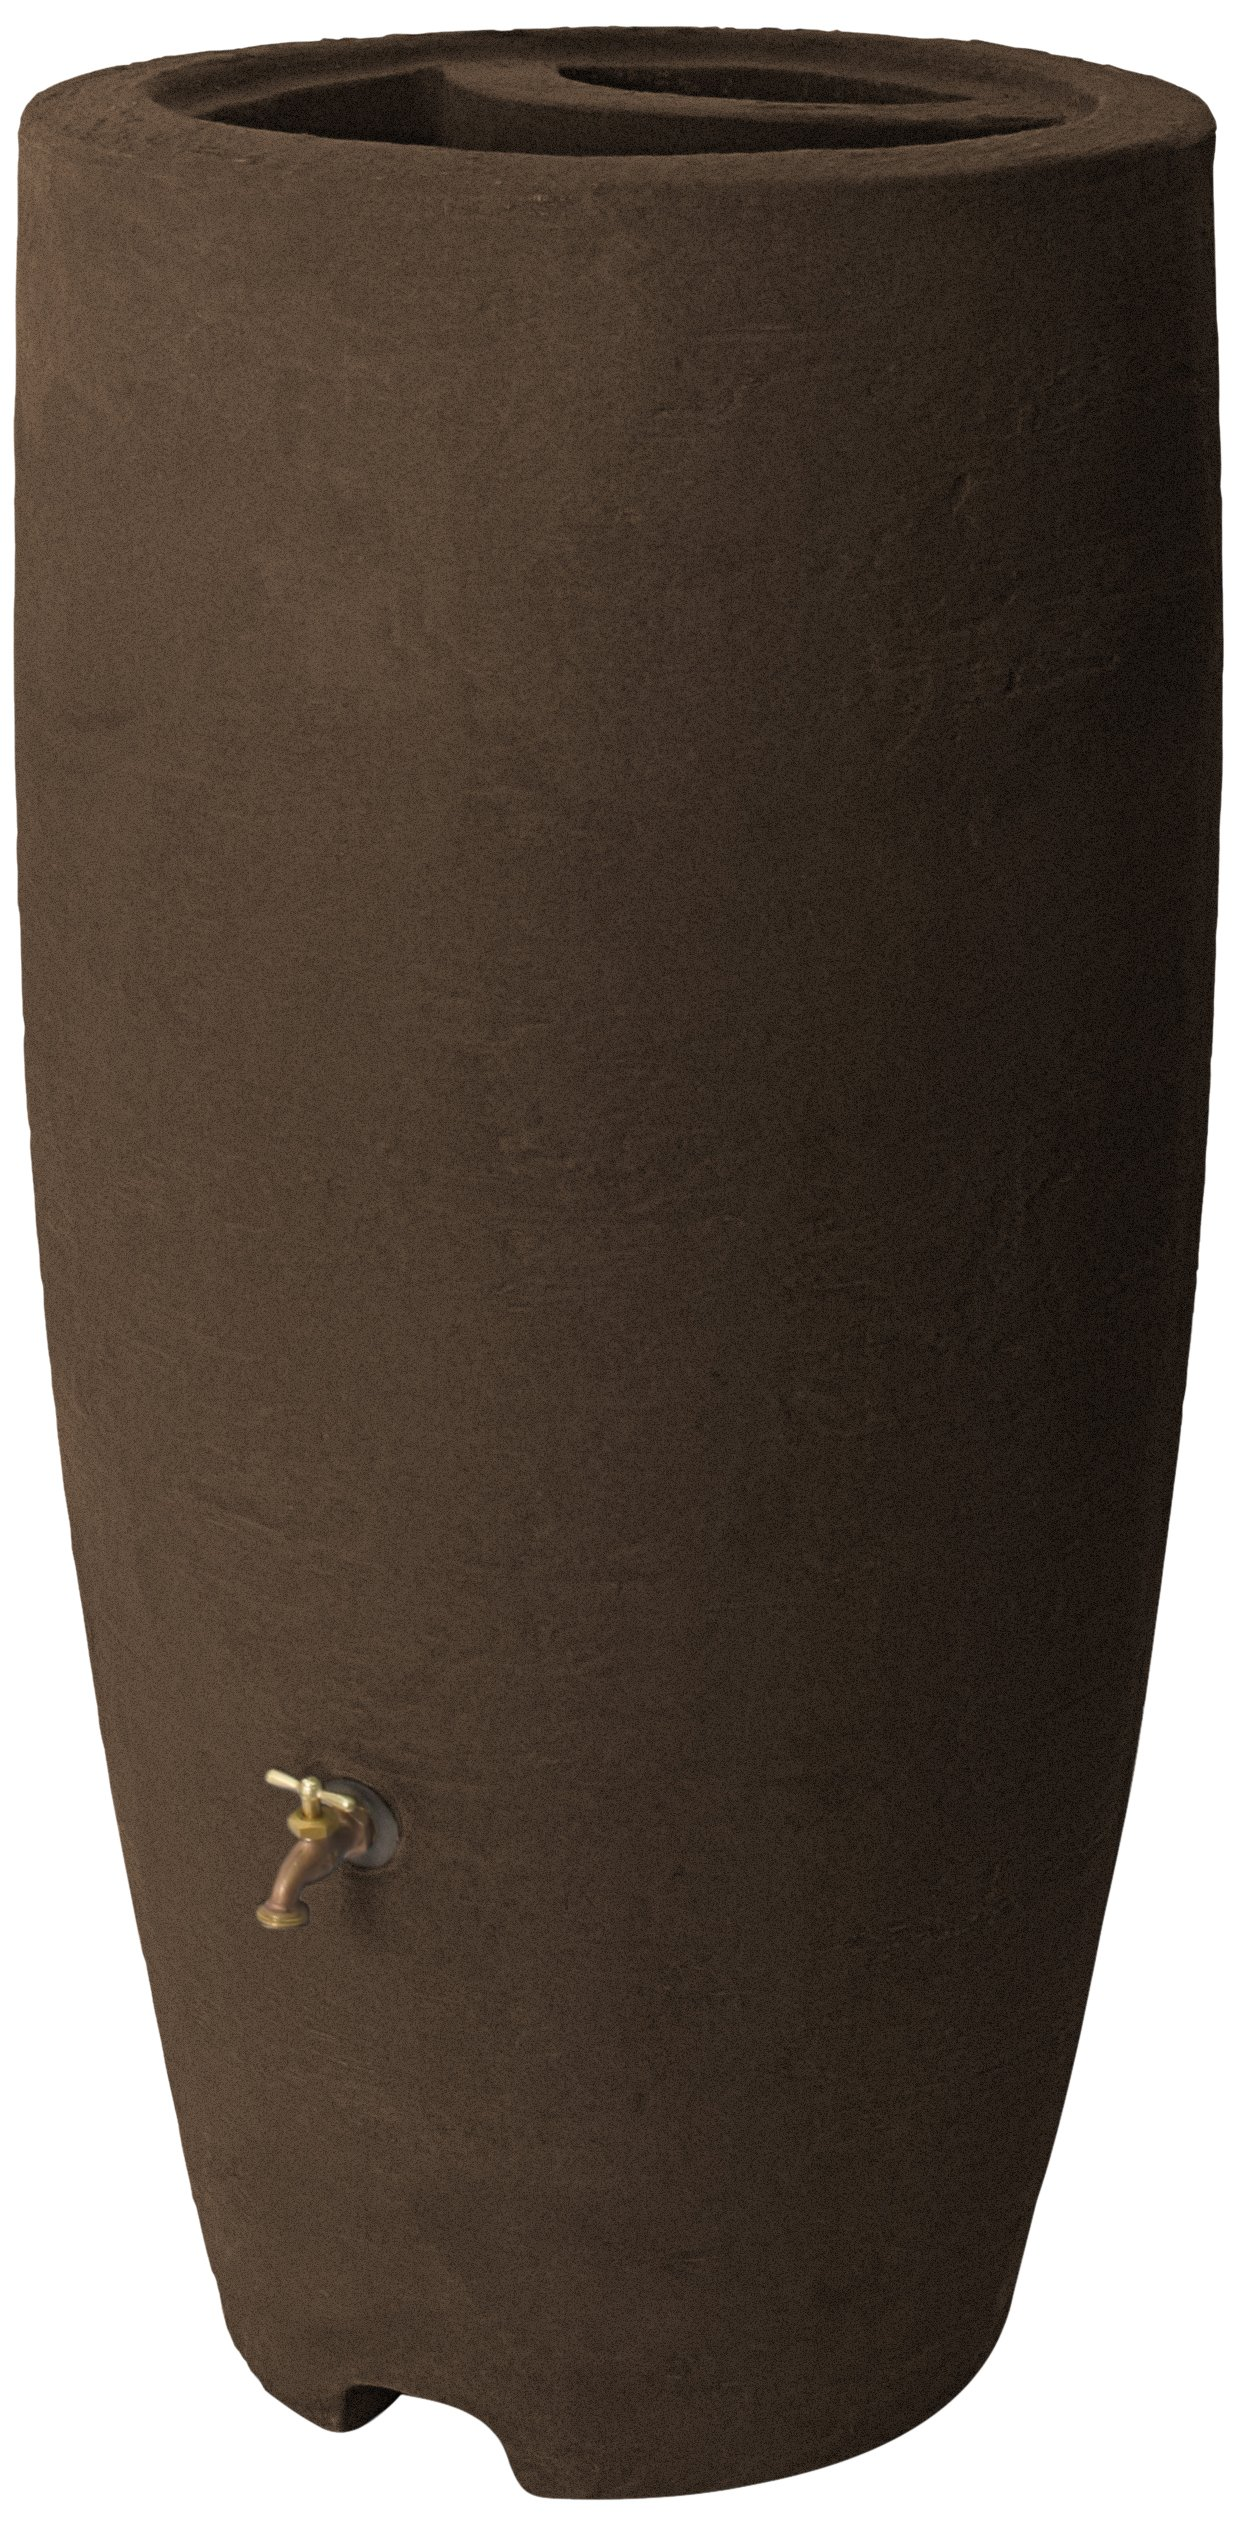 Algreen Products Athena Rain Barrel 80-Gallon, Brownstone by Algreen